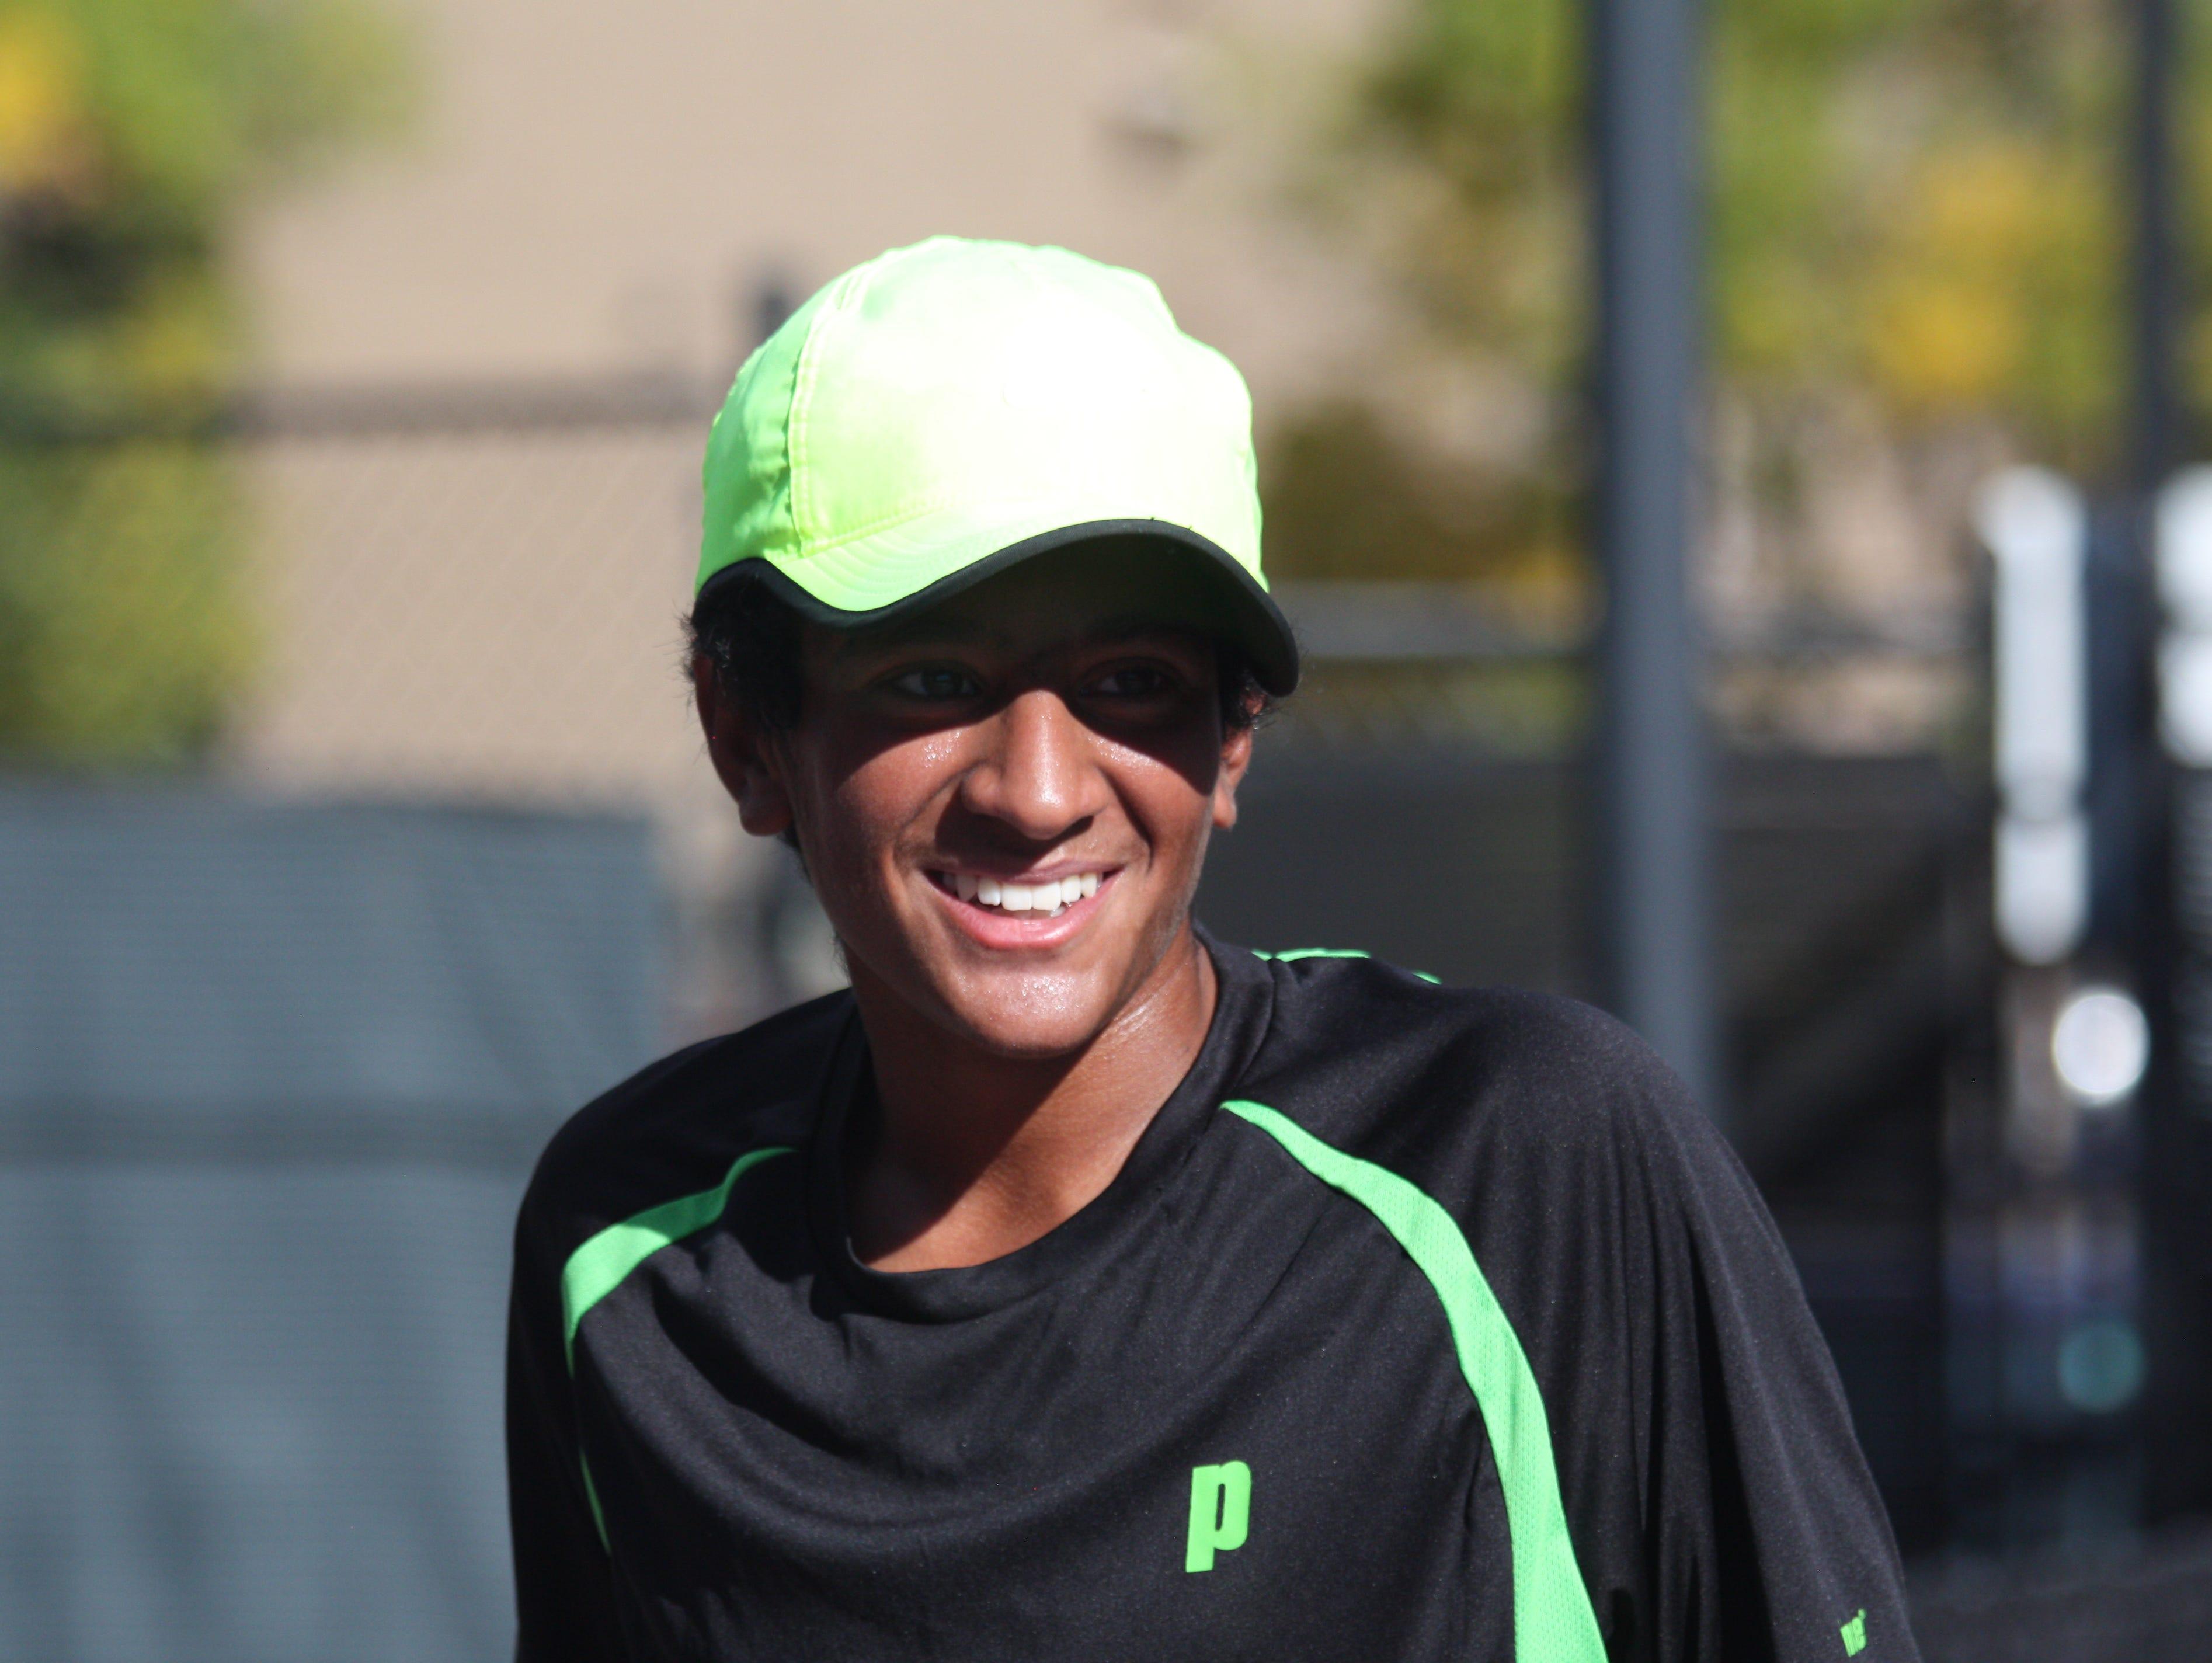 Fossil Ridge freshman Akhil Gupta is the Coloradoan's Male Athlete of the Week.